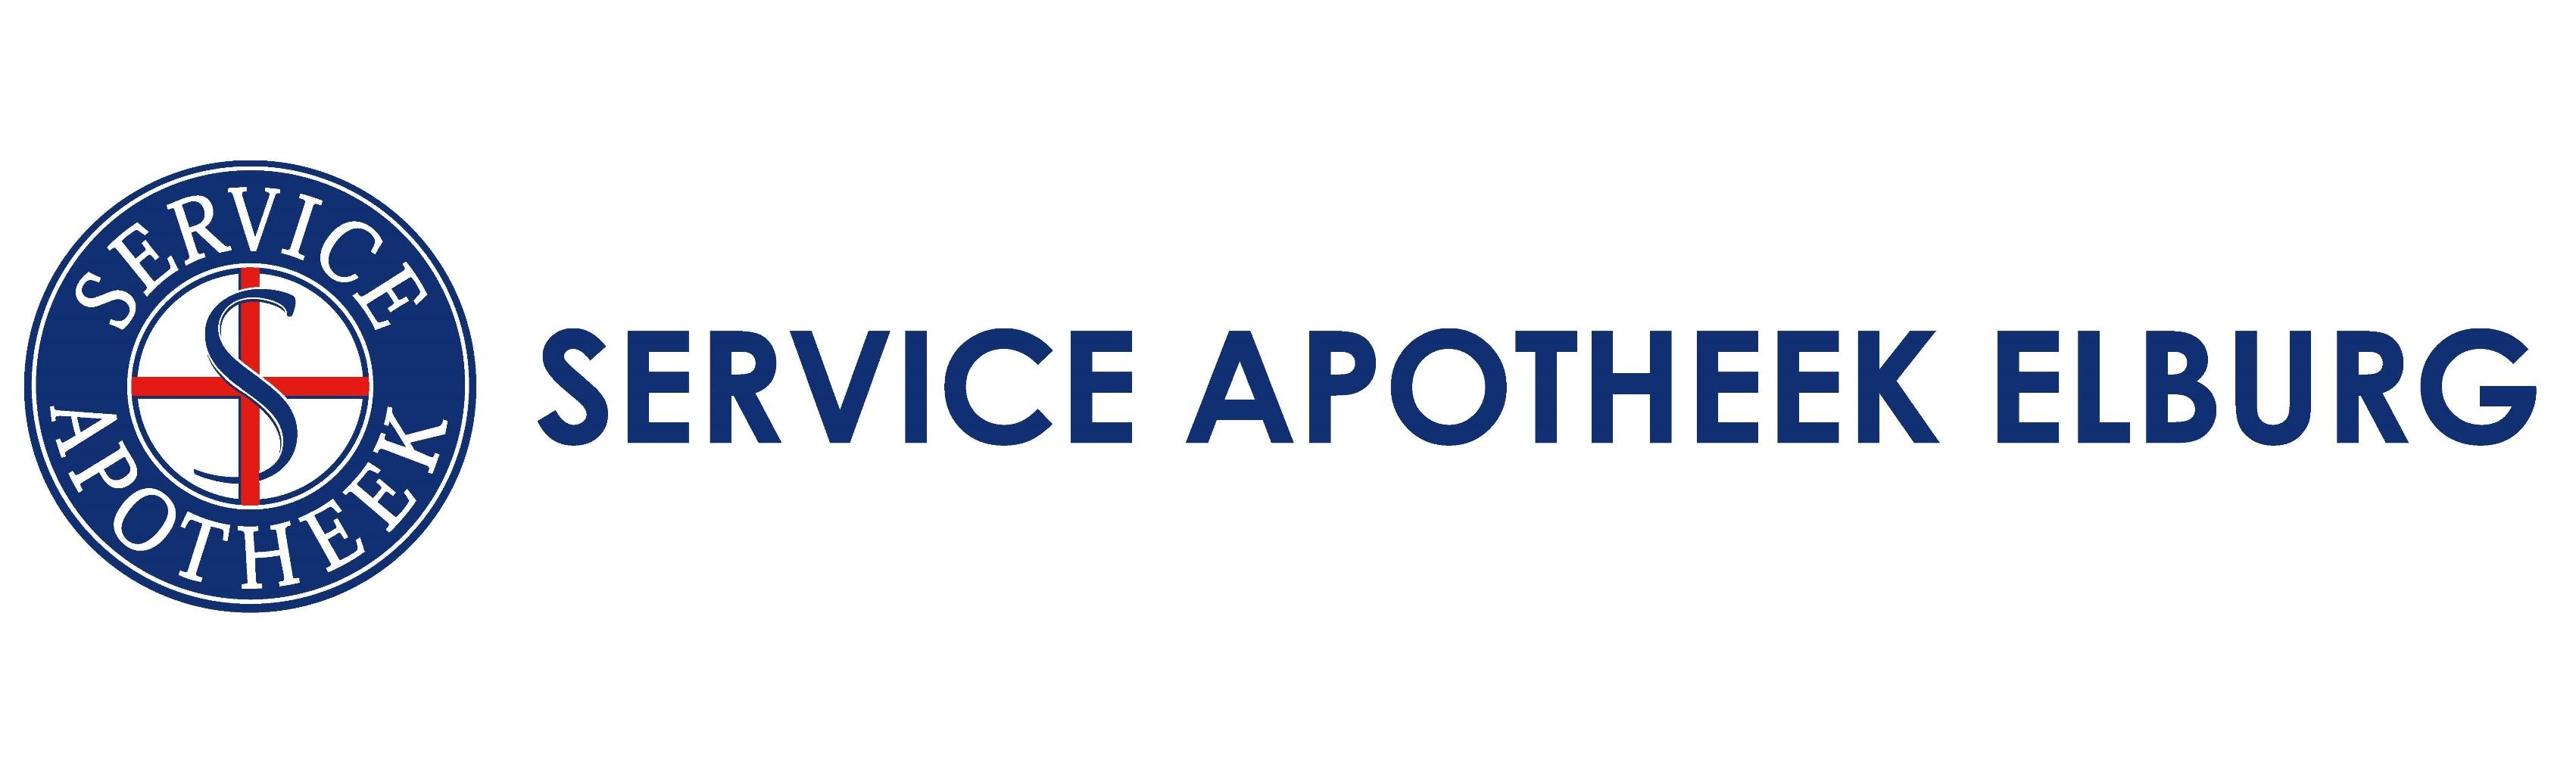 Logo: Service Apotheek Elburg